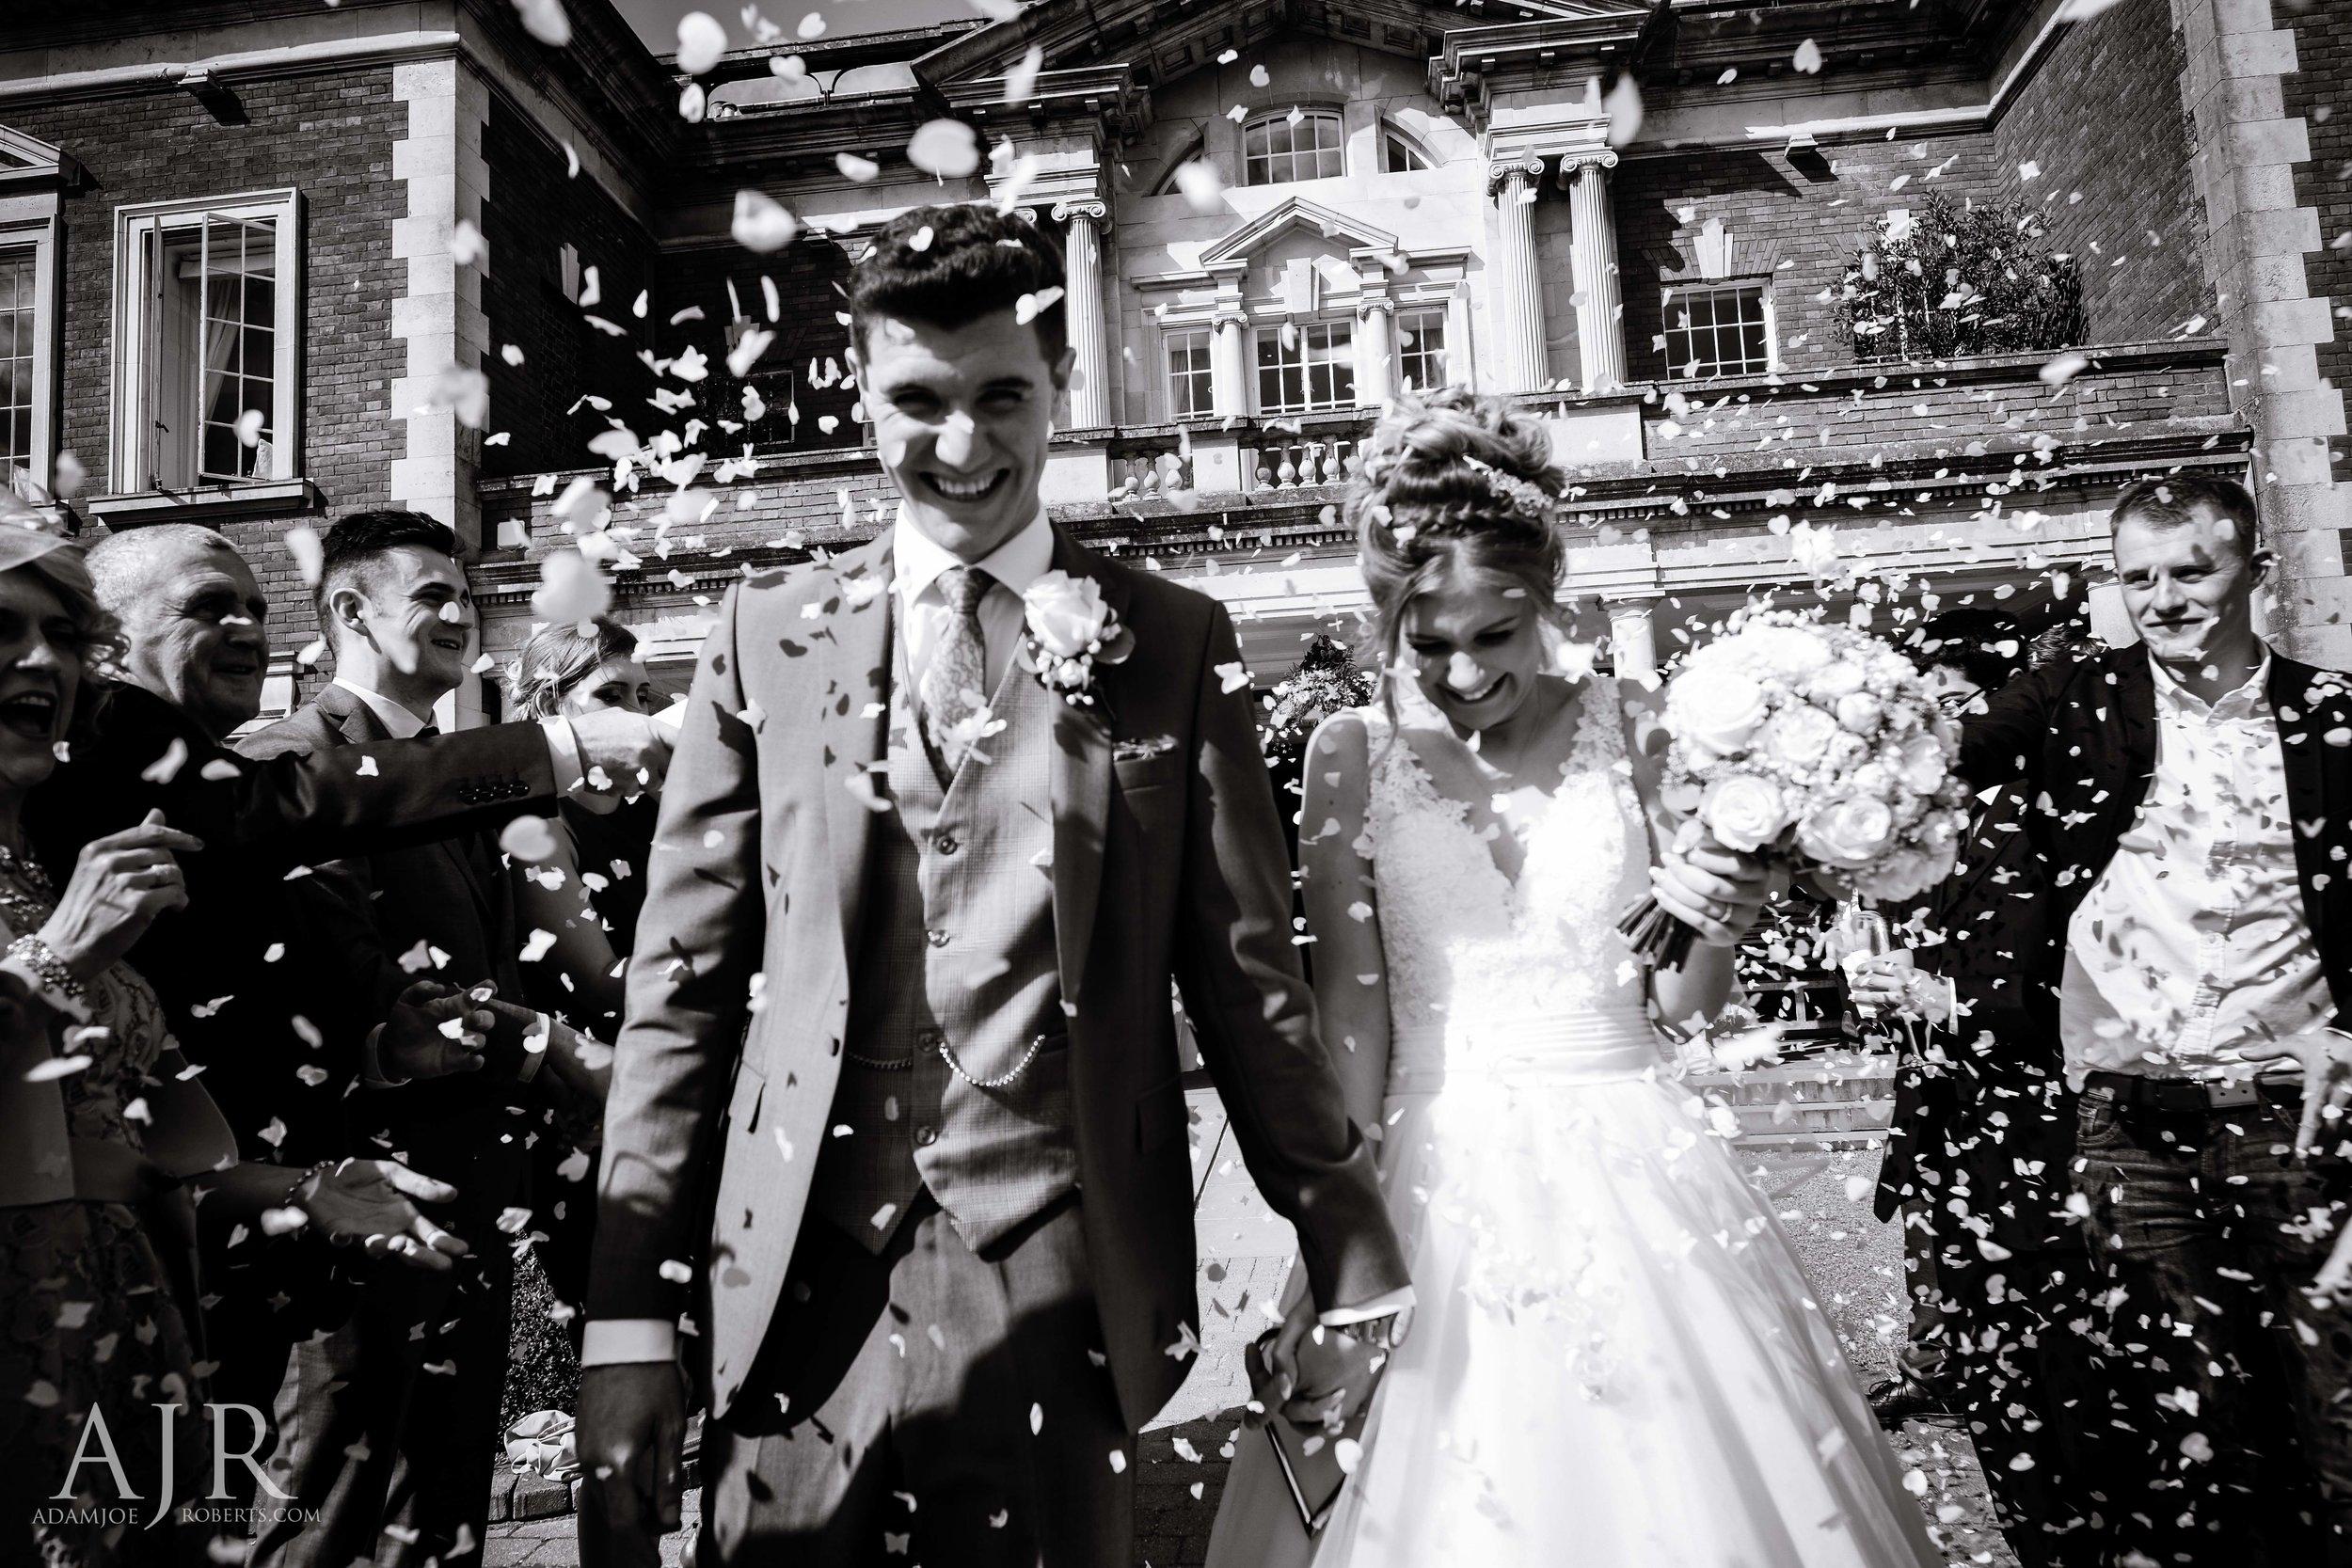 Eaves hall documenrty wedding photography | widnes cheshire wedding photographer sneak peek (6 of 11).jpg